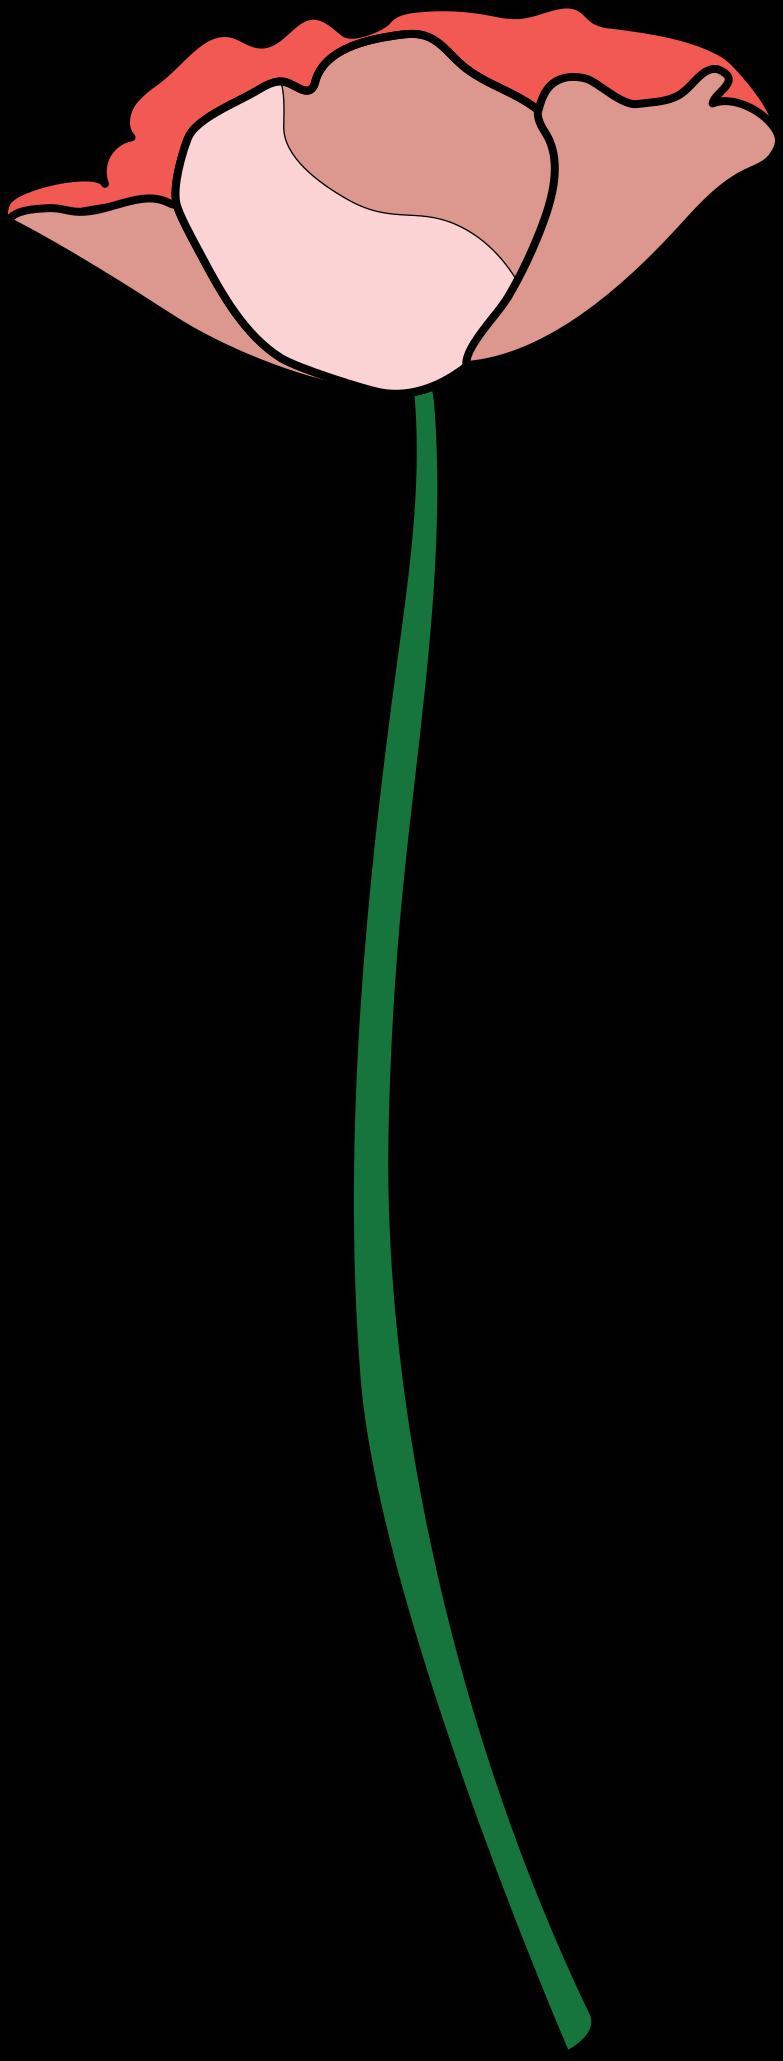 poppy flower Clipart illustration in PNG, SVG